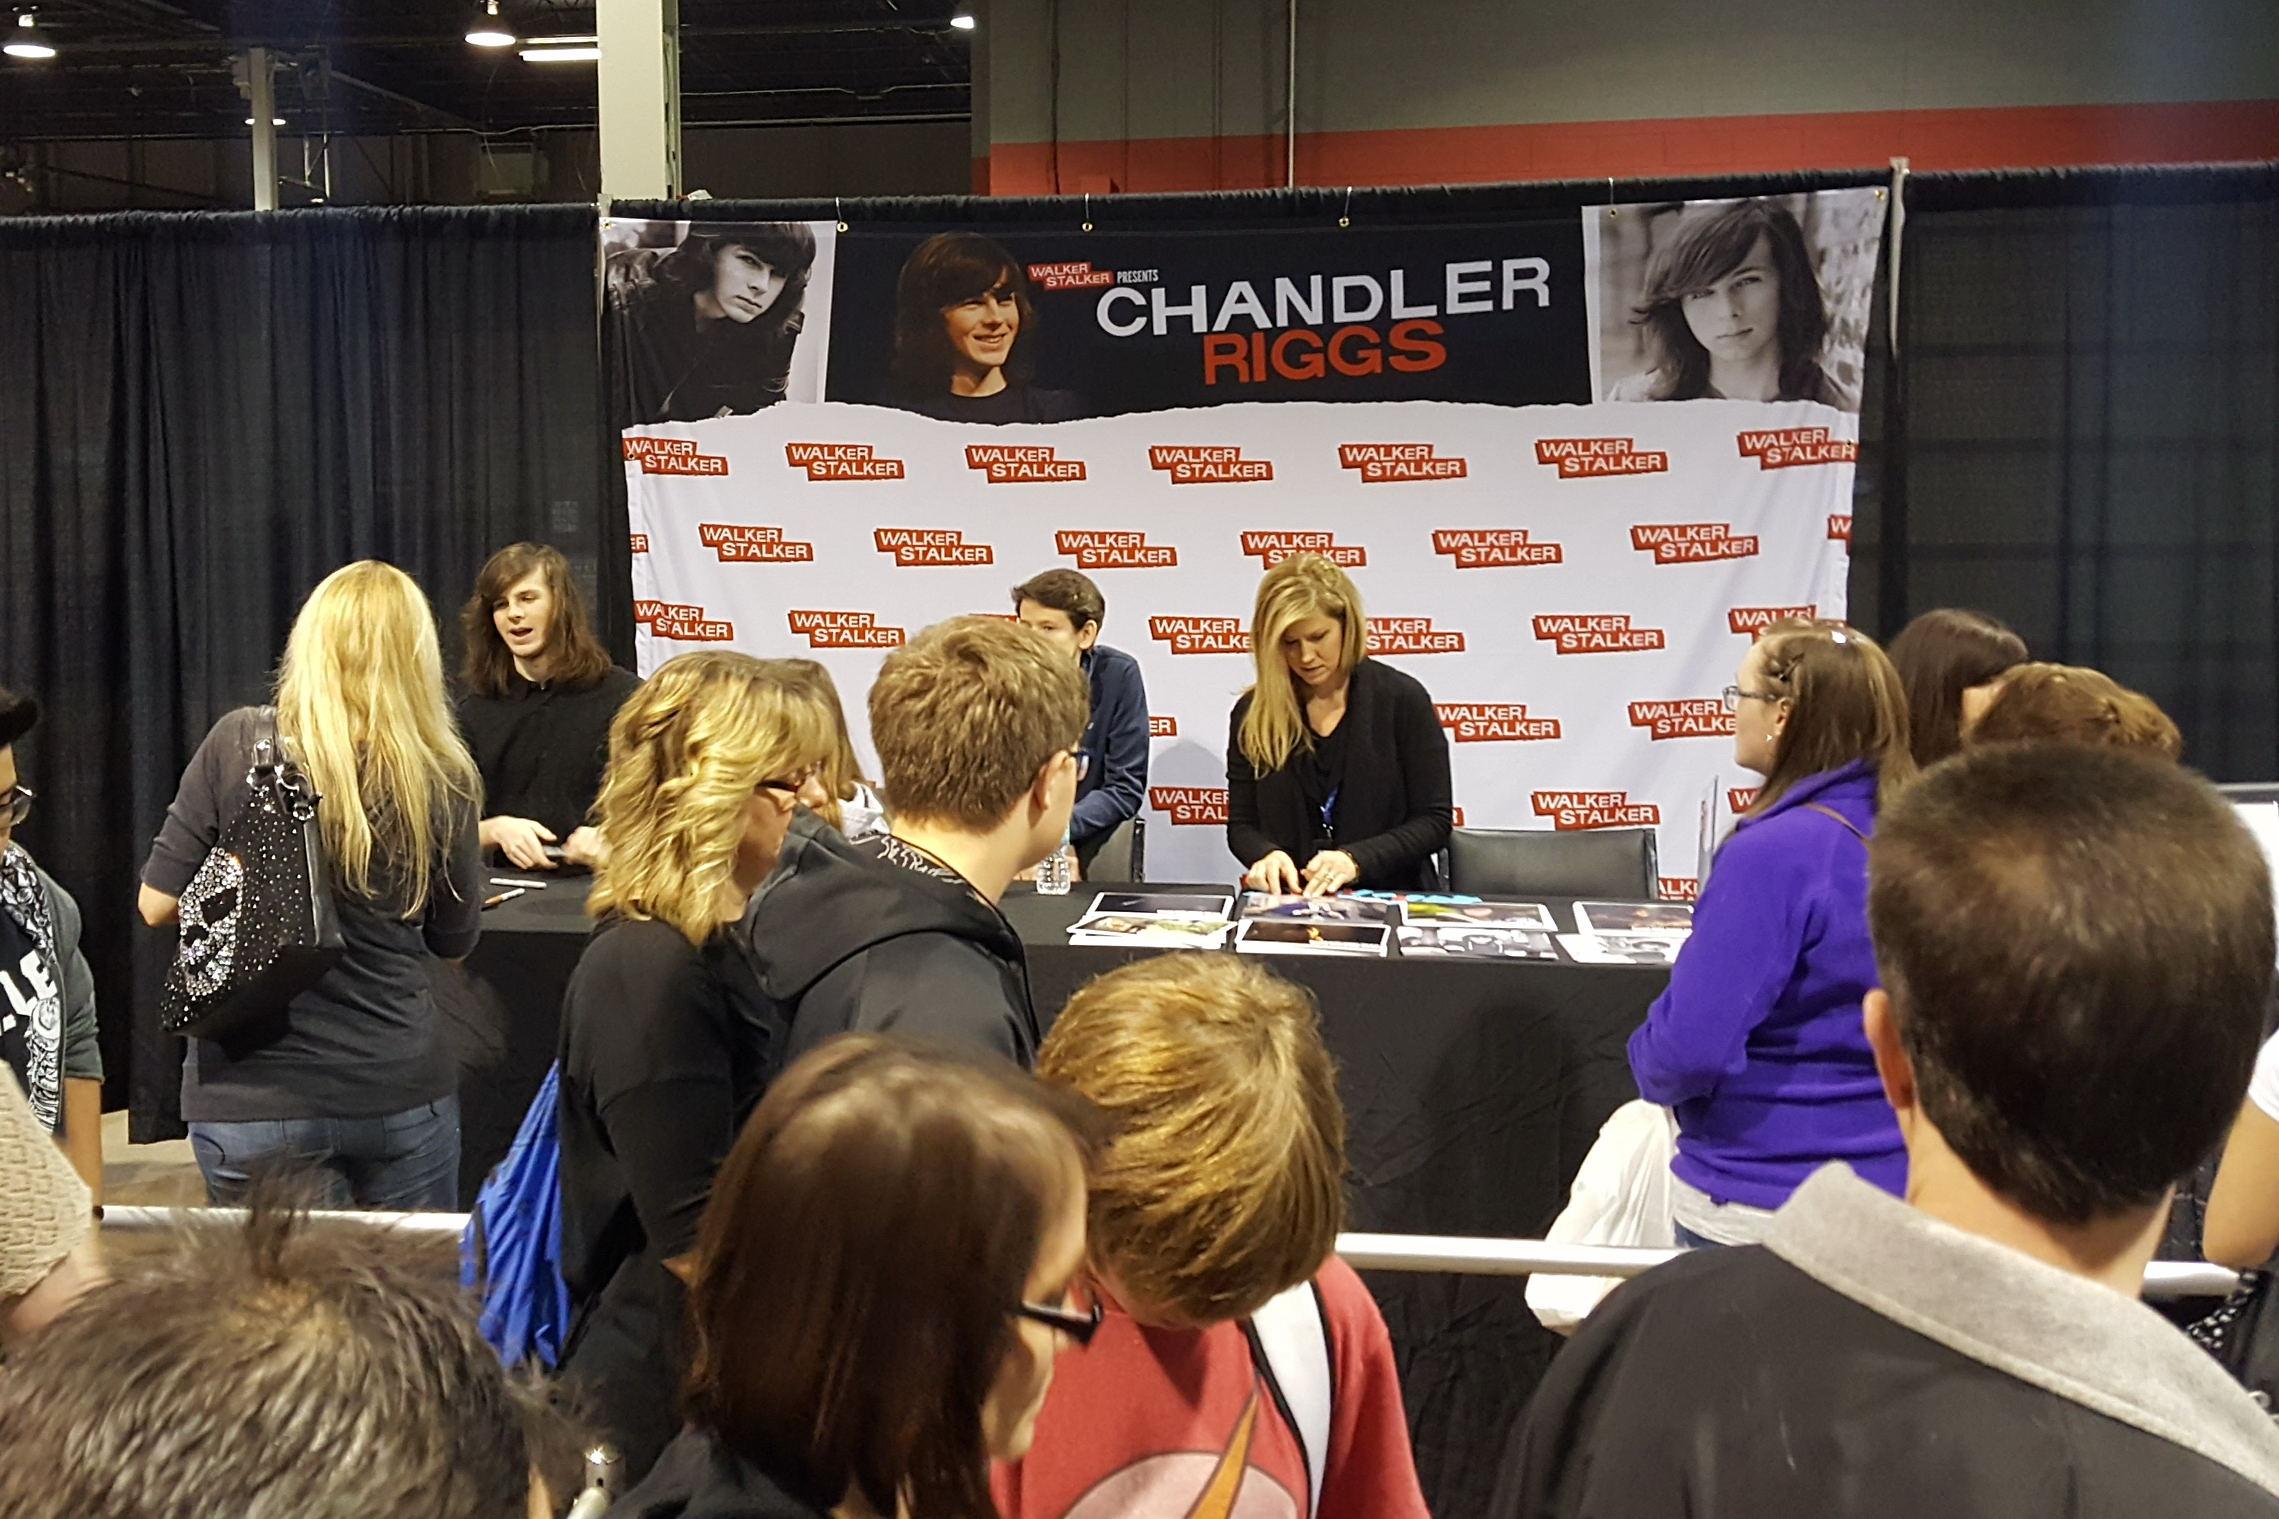 Fan Fest Chicago 2017, Chandler Riggs, Carl Grimes, The Walking Dead